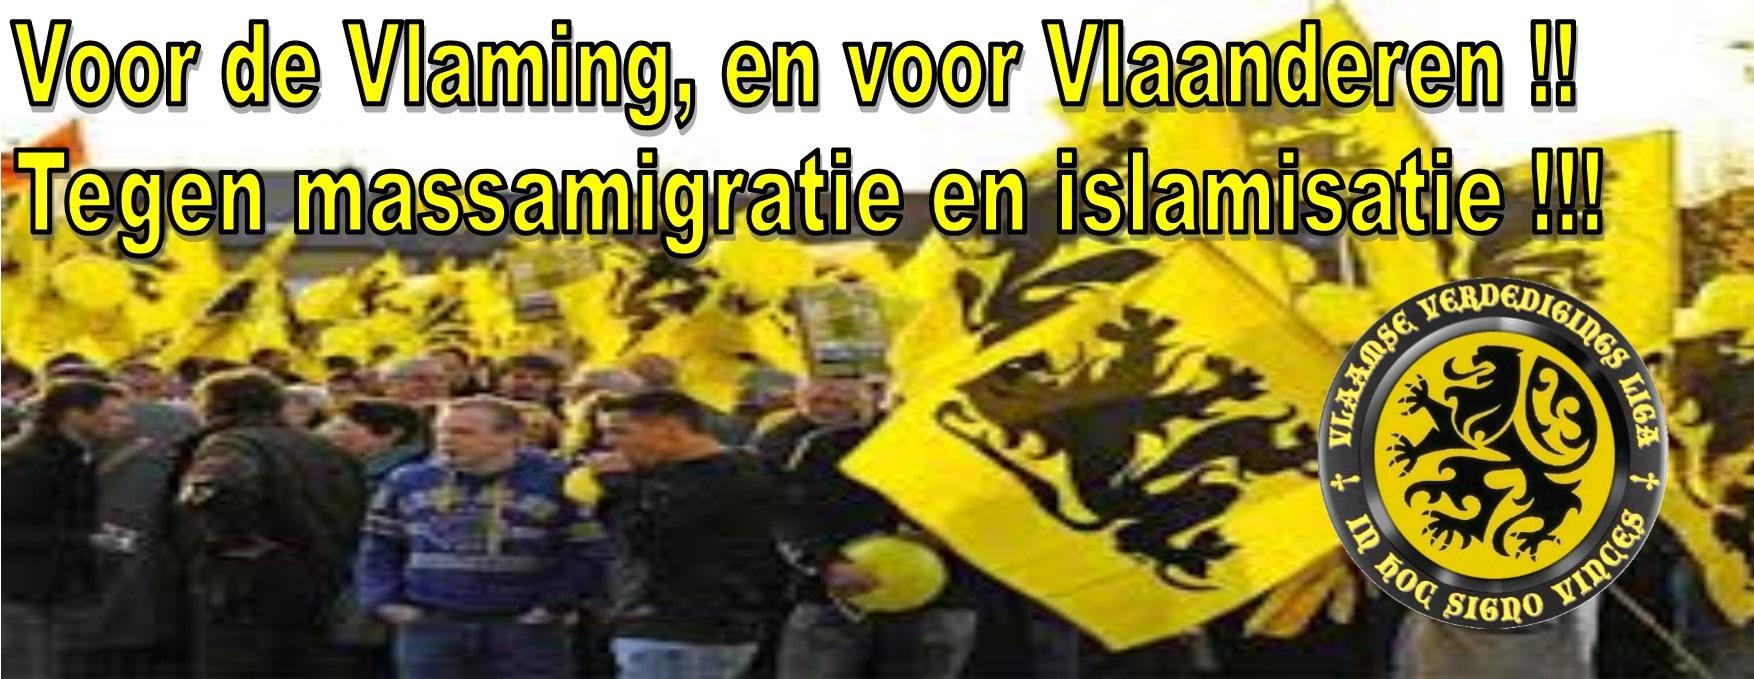 Vlaamse Vededigingsliga